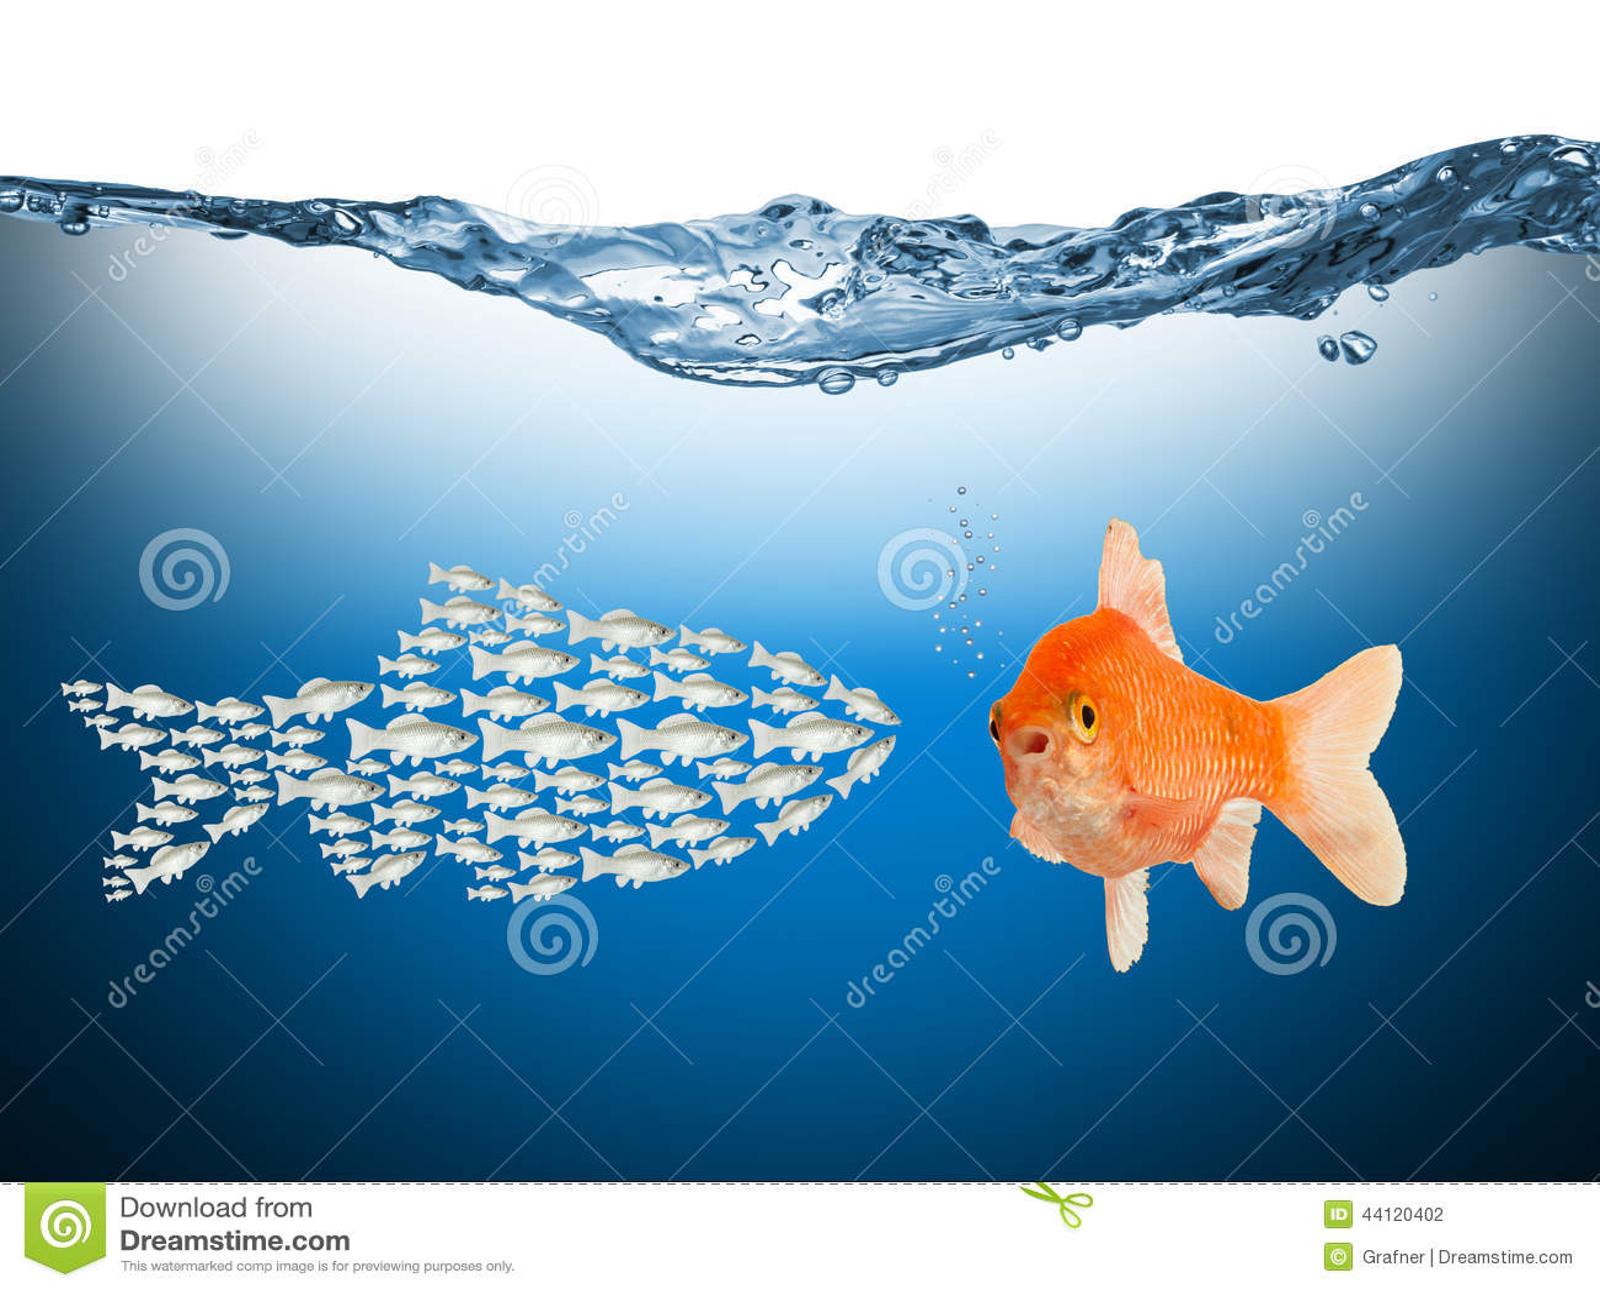 Fisch teamwork concept